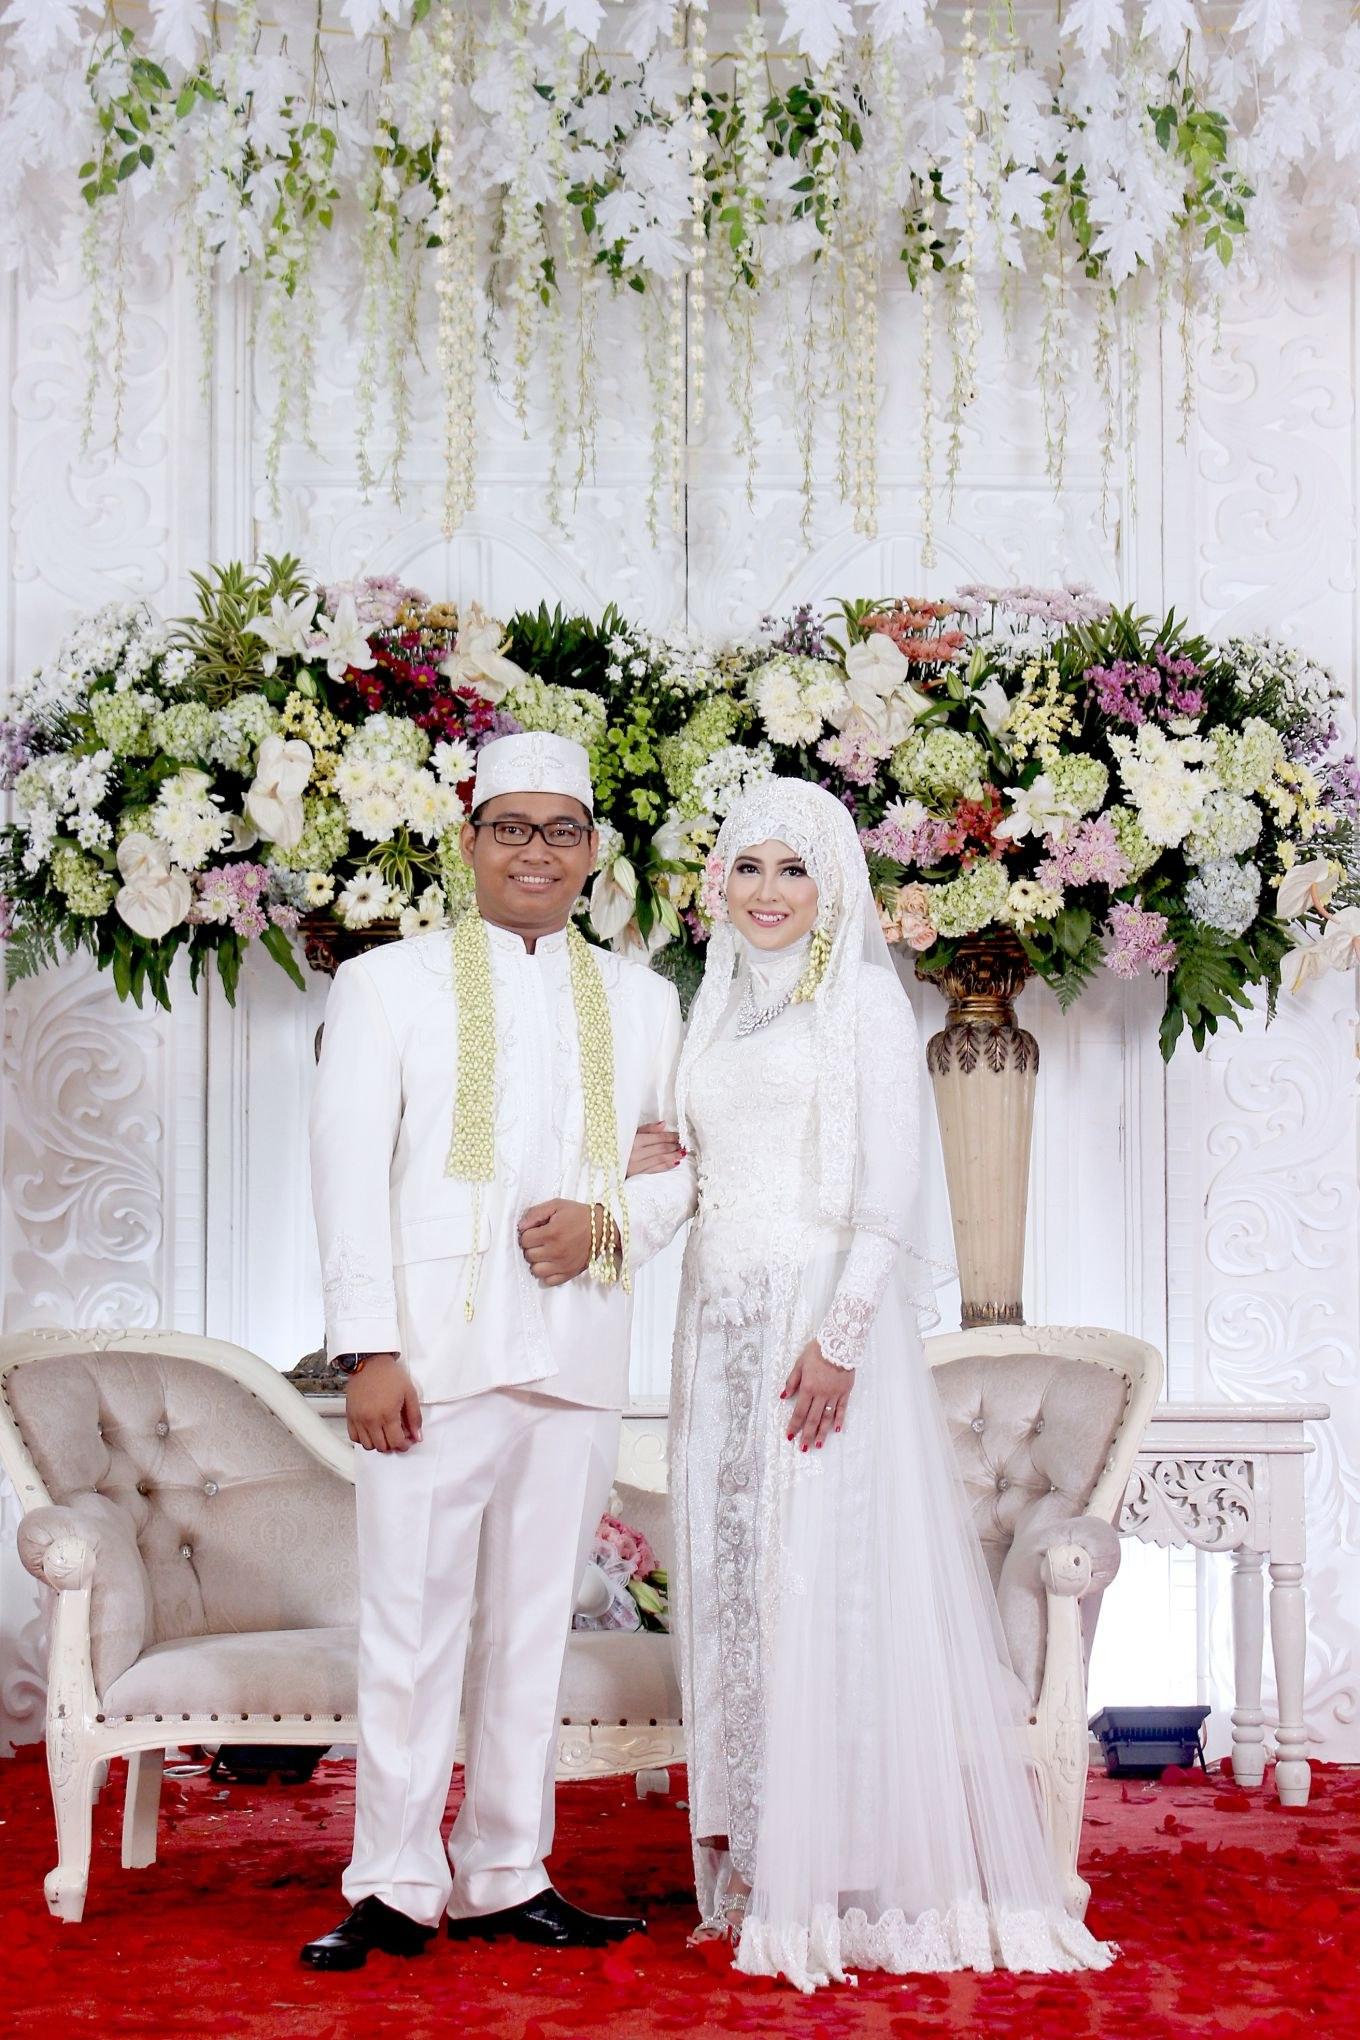 Ide Baju Pengantin Adat Jawa Muslim Wddj Ide Modis Baju Pengantin Muslim Adat Bugis